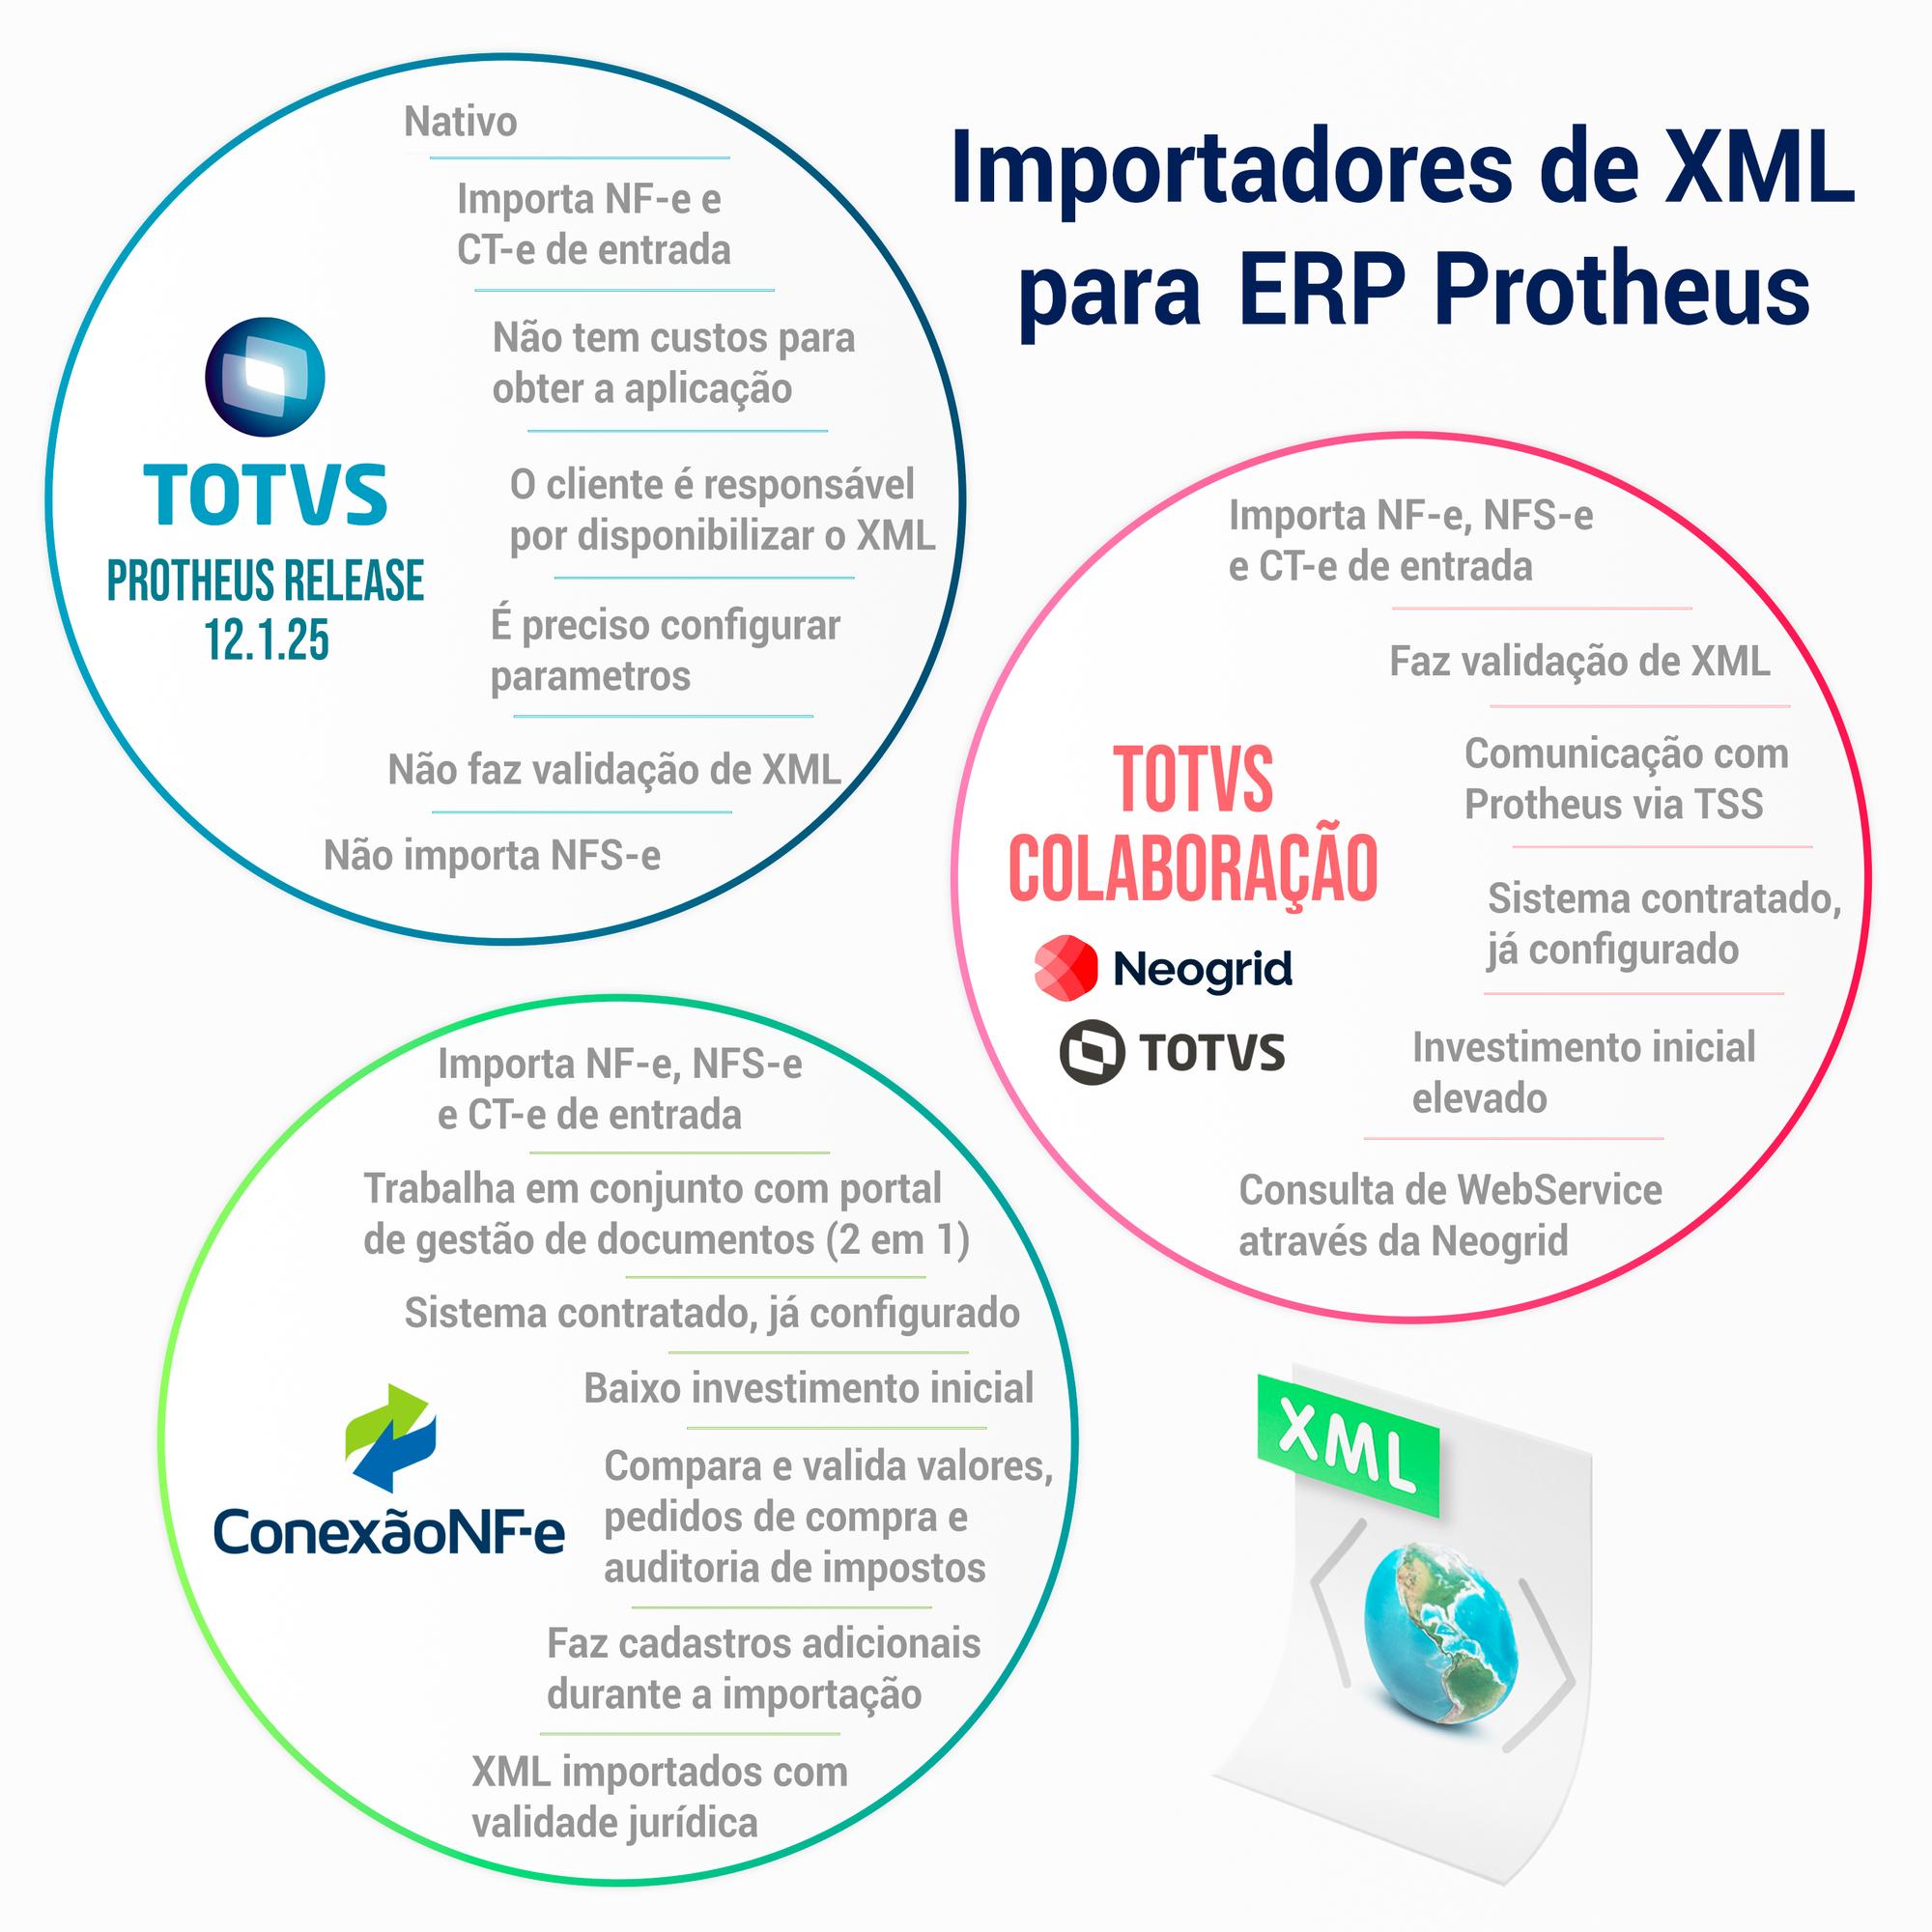 infografico-importadores-de-xml